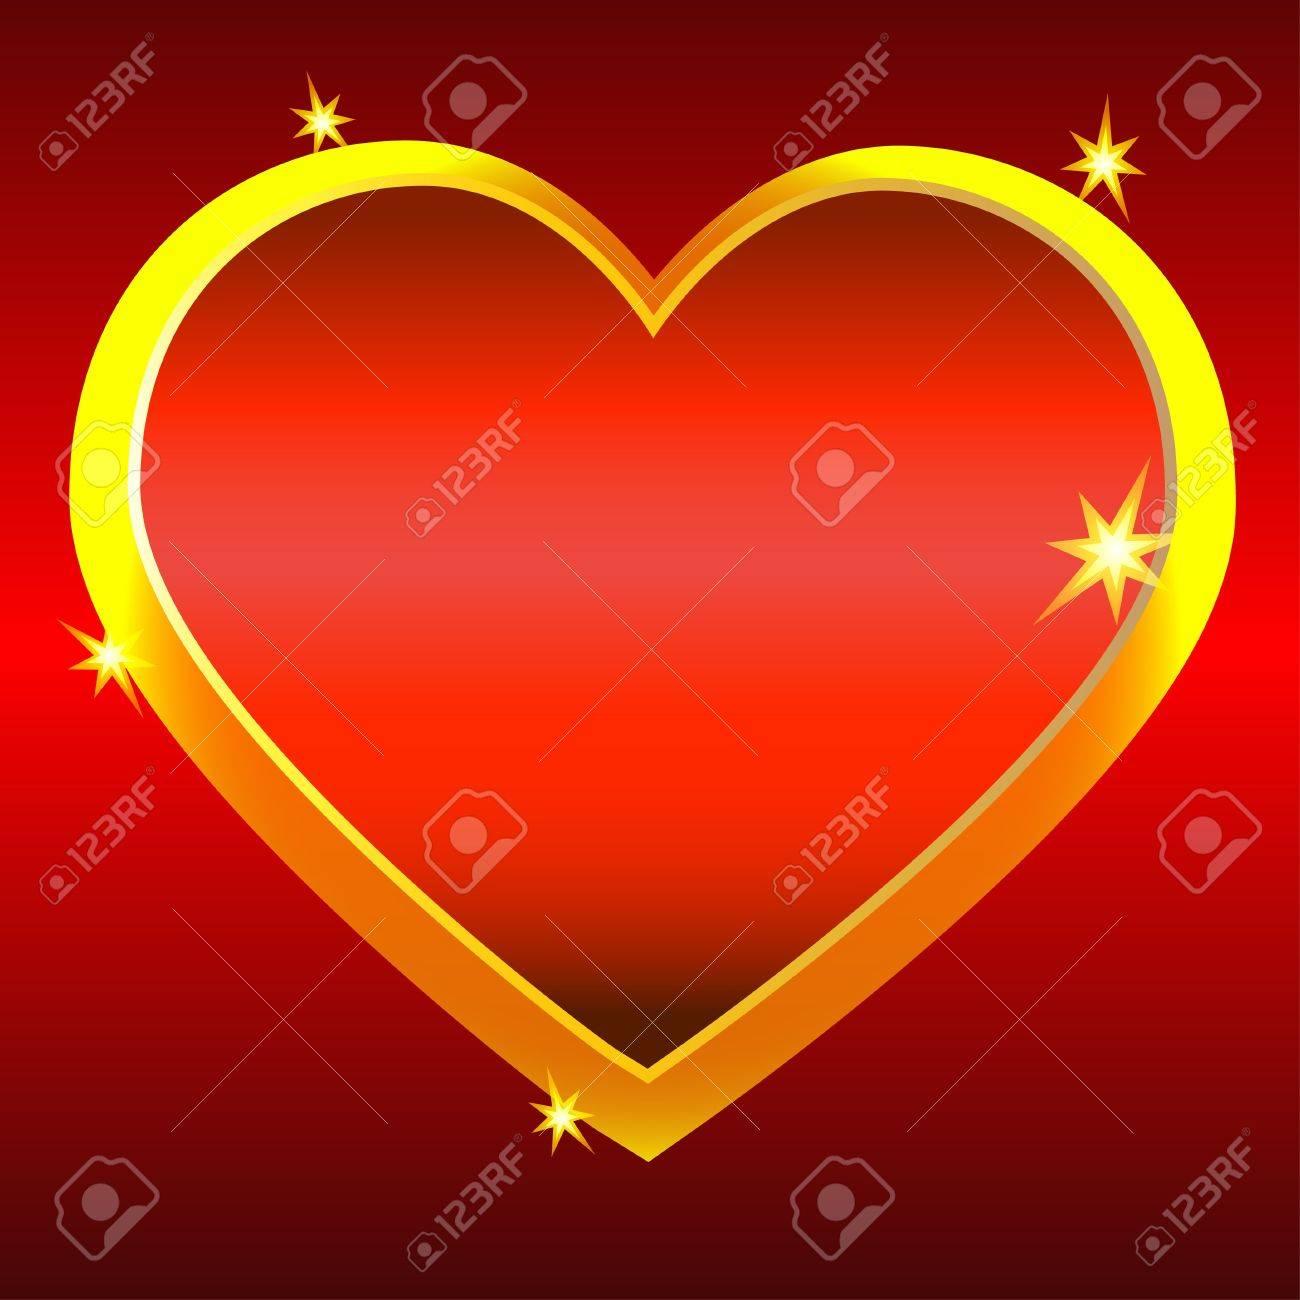 Golden heart on red background-vector Stock Vector - 18120037